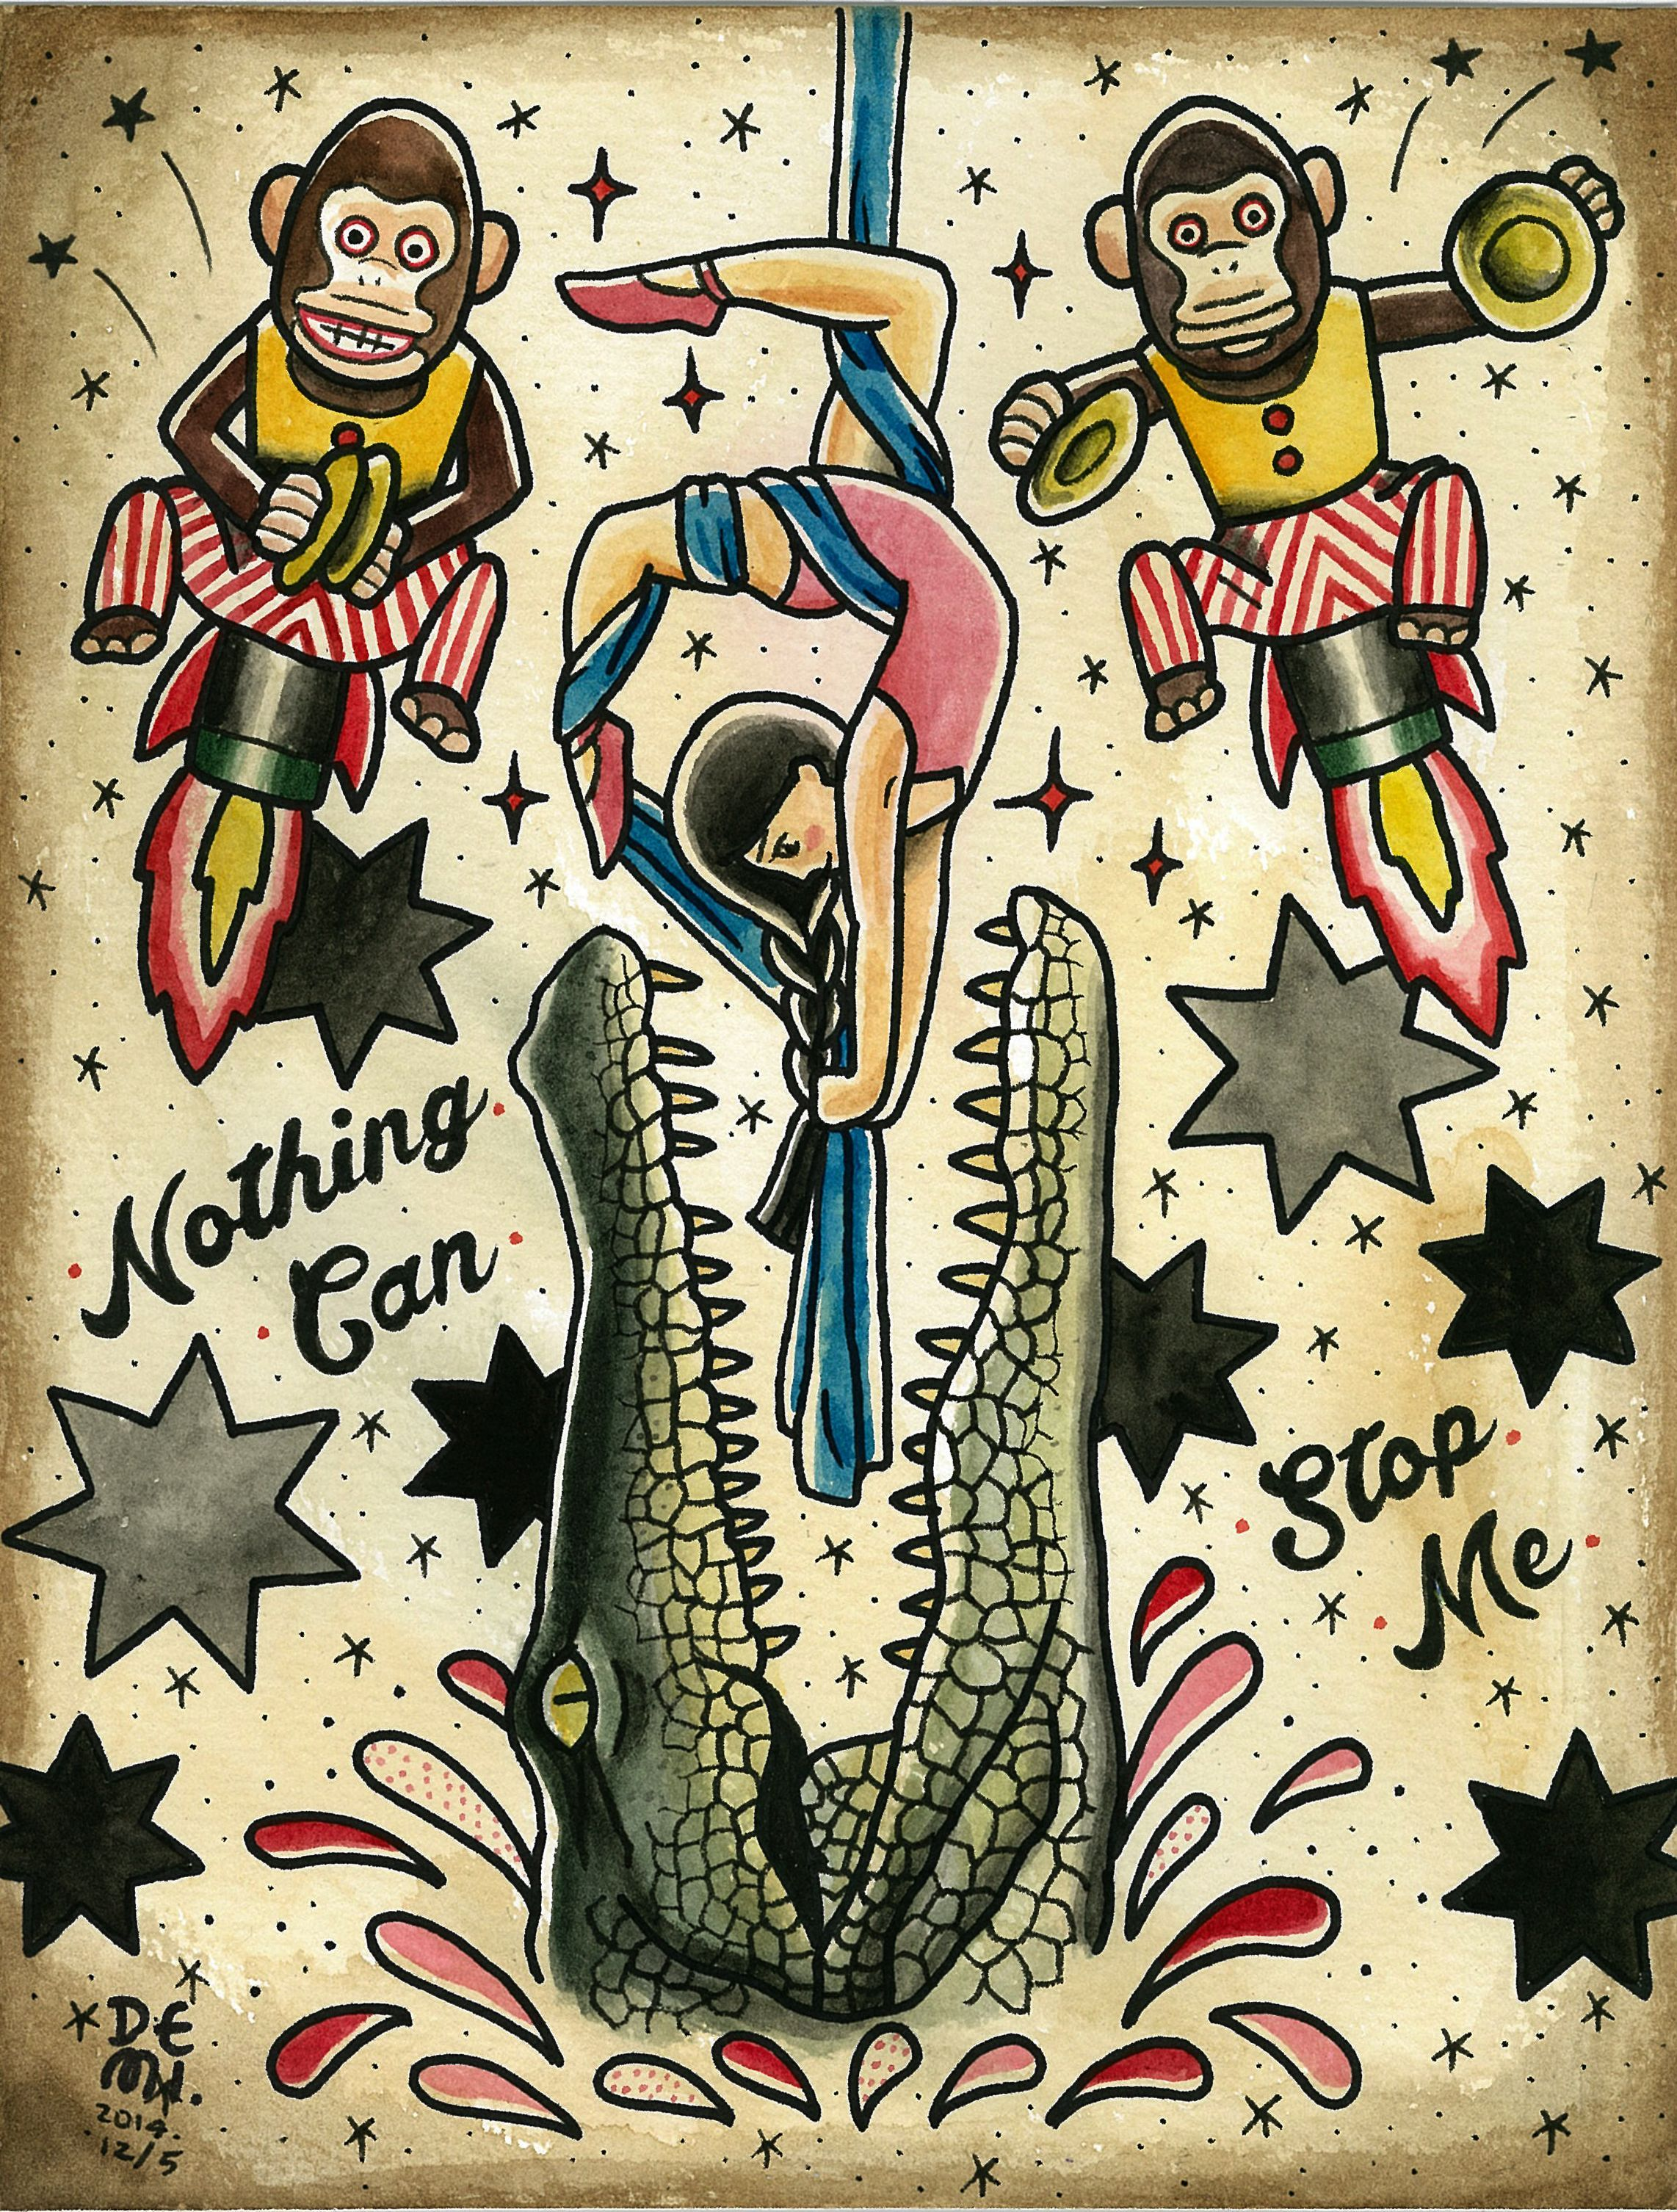 5cb5dafc87a31 vintage straight edge tattoo flash - Google Search Traditional Tattoo Old  School, Traditional Tattoo Design